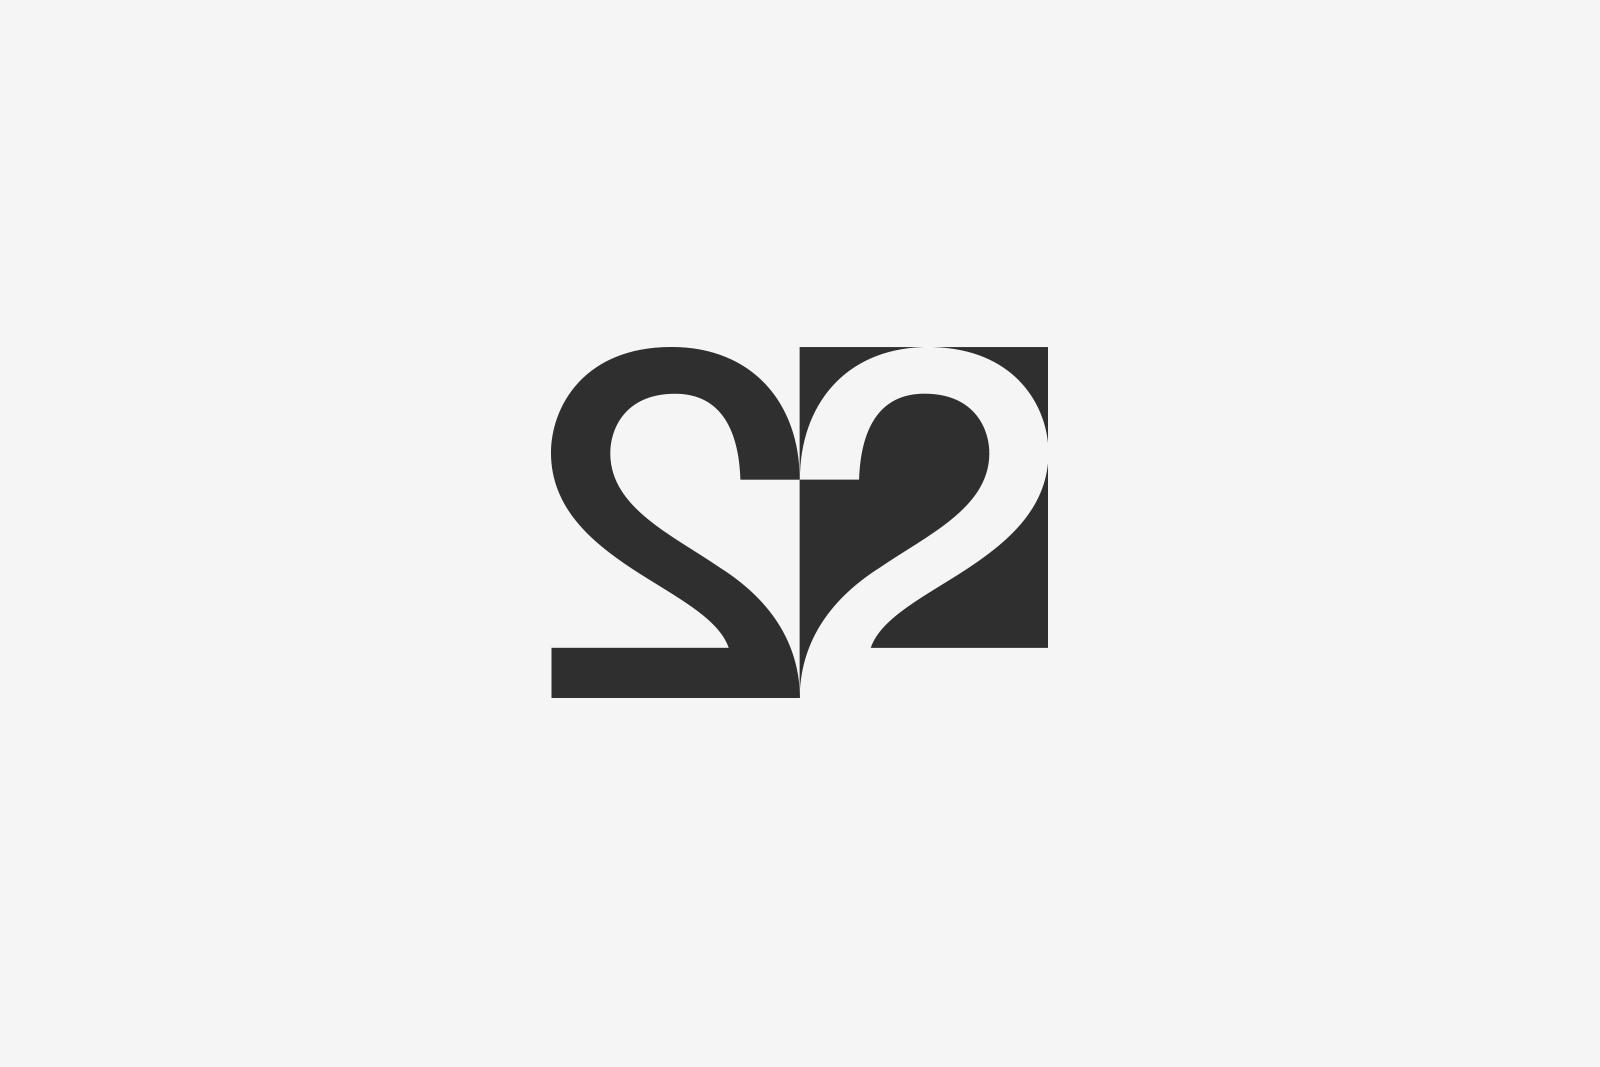 Logo Sketch 2 Bw